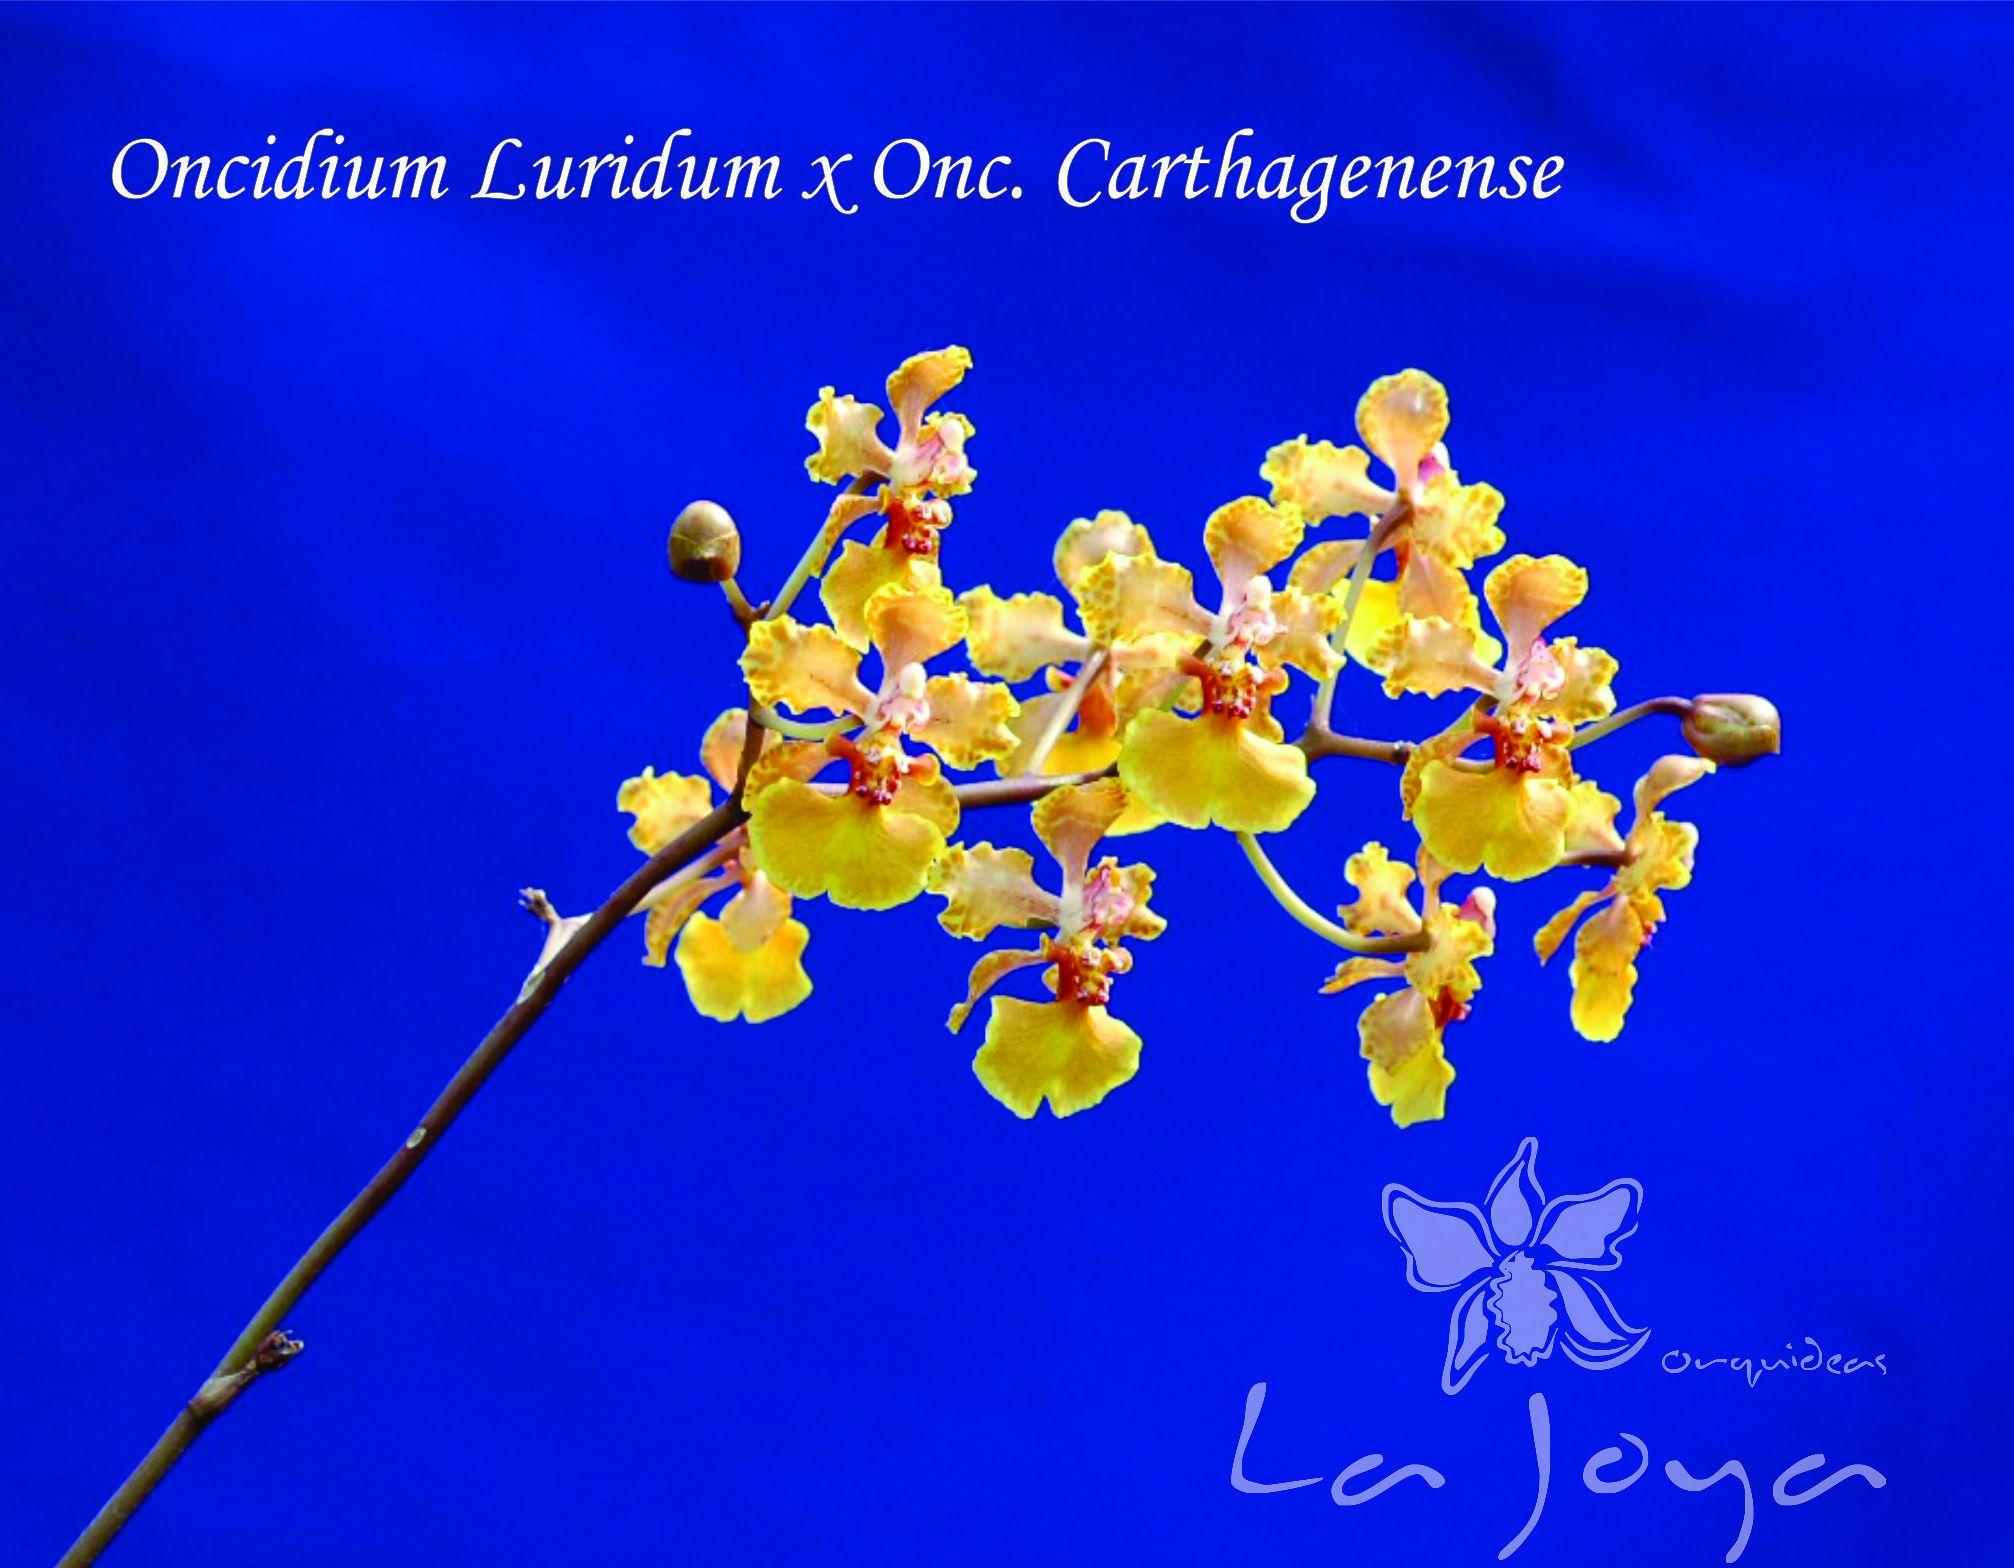 Oncidium Luridum x Onc. Carthagenense